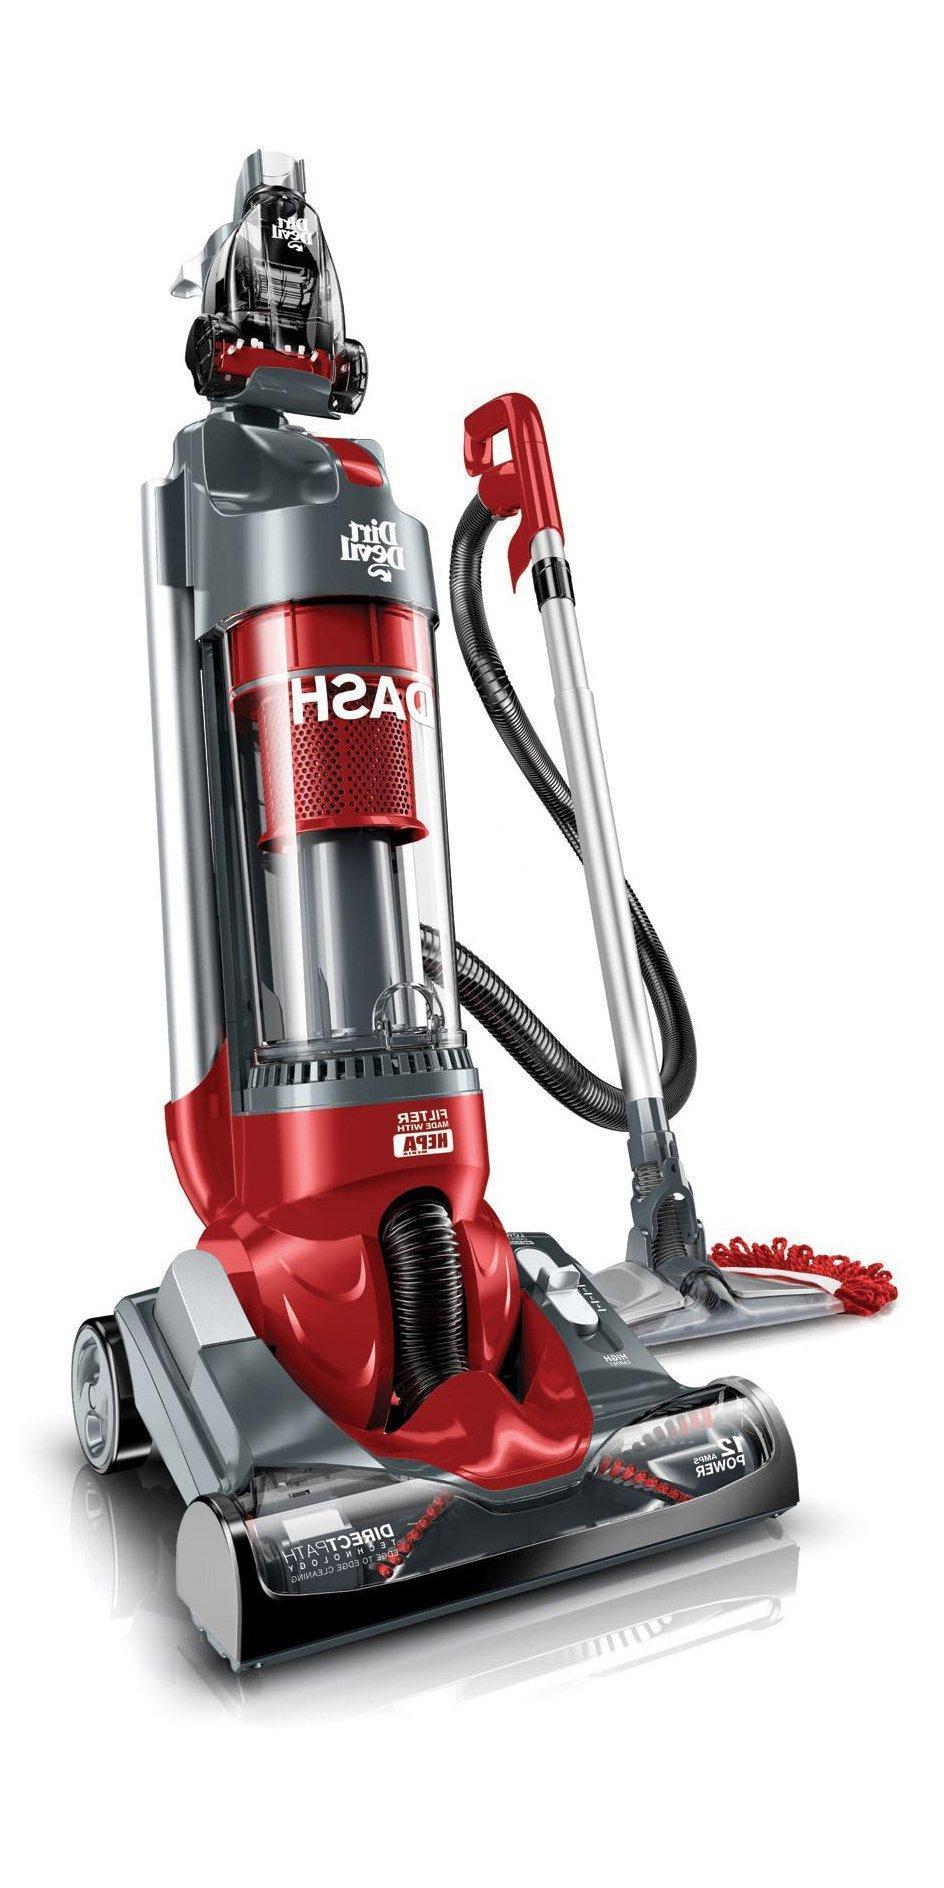 Dirt Devil - Dash Bagless Upright Vacuum - Red/gray